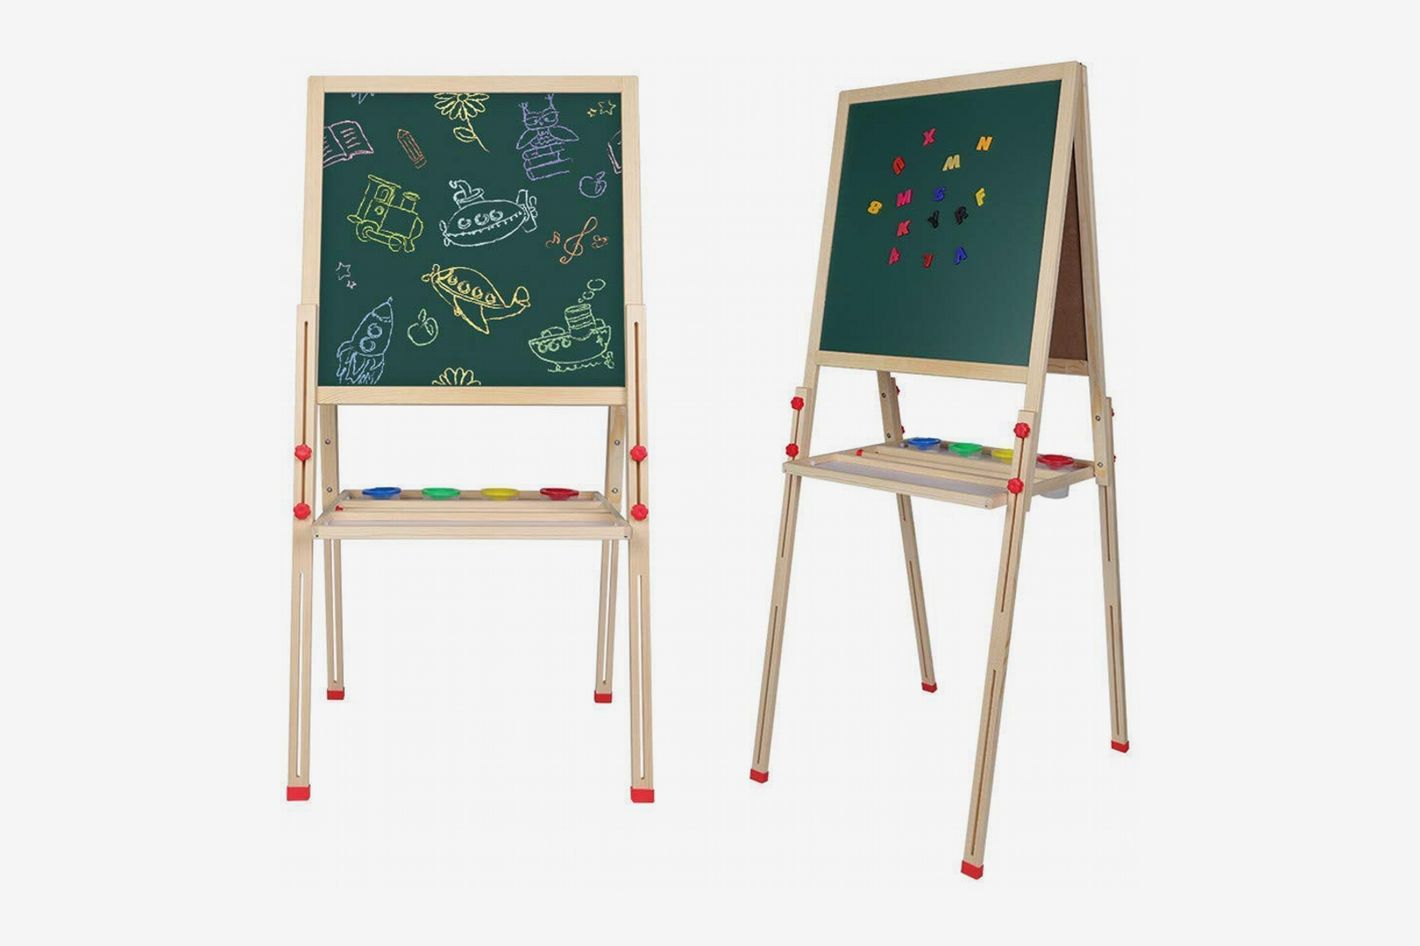 Walfront Adjustable Wooden Dry-Erase Board Standing Art Easel